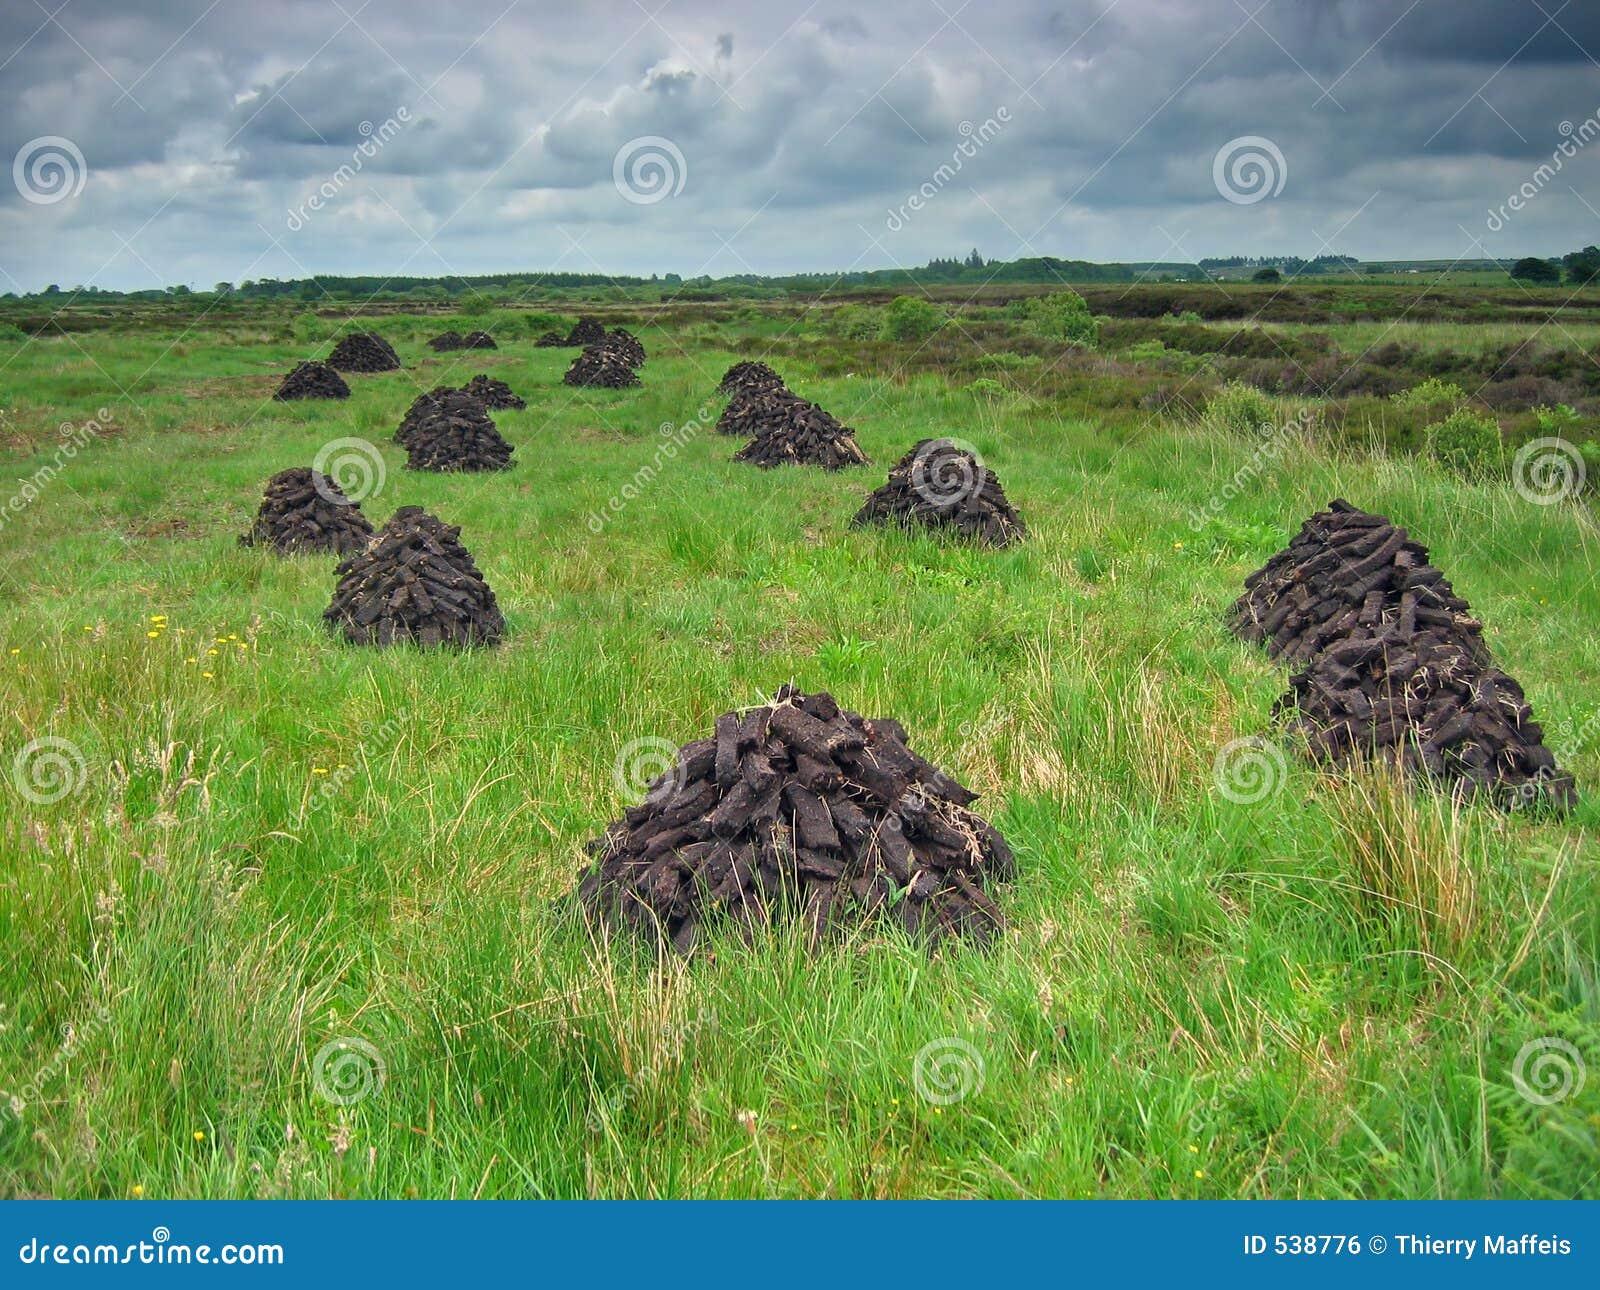 Download 干燥泥煤 库存照片. 图片 包括有 威胁, 农田, 肥沃, 农村, bogart, 云彩, 乡下, 底土, 干燥 - 538776